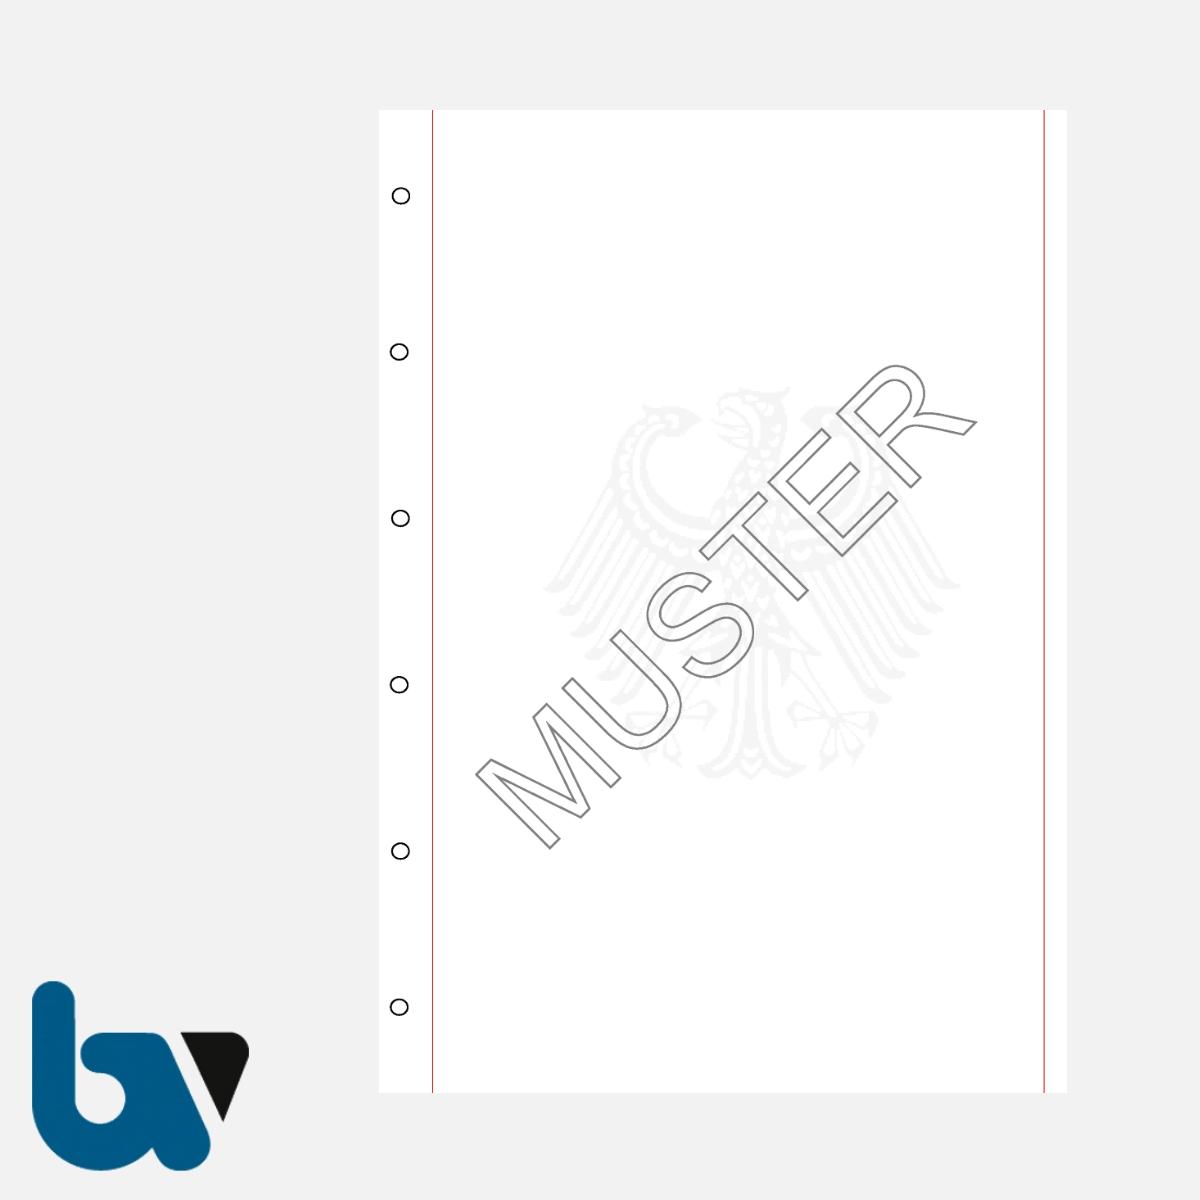 0/168-8gsb Urkundenpapier Standesamt Personenstand Urkunde Register Dokument 6-fach Lochung gelocht Bundesadler rot Schmuckrand 100gr Stammbuch Format 130 200 | Borgard Verlag GmbH